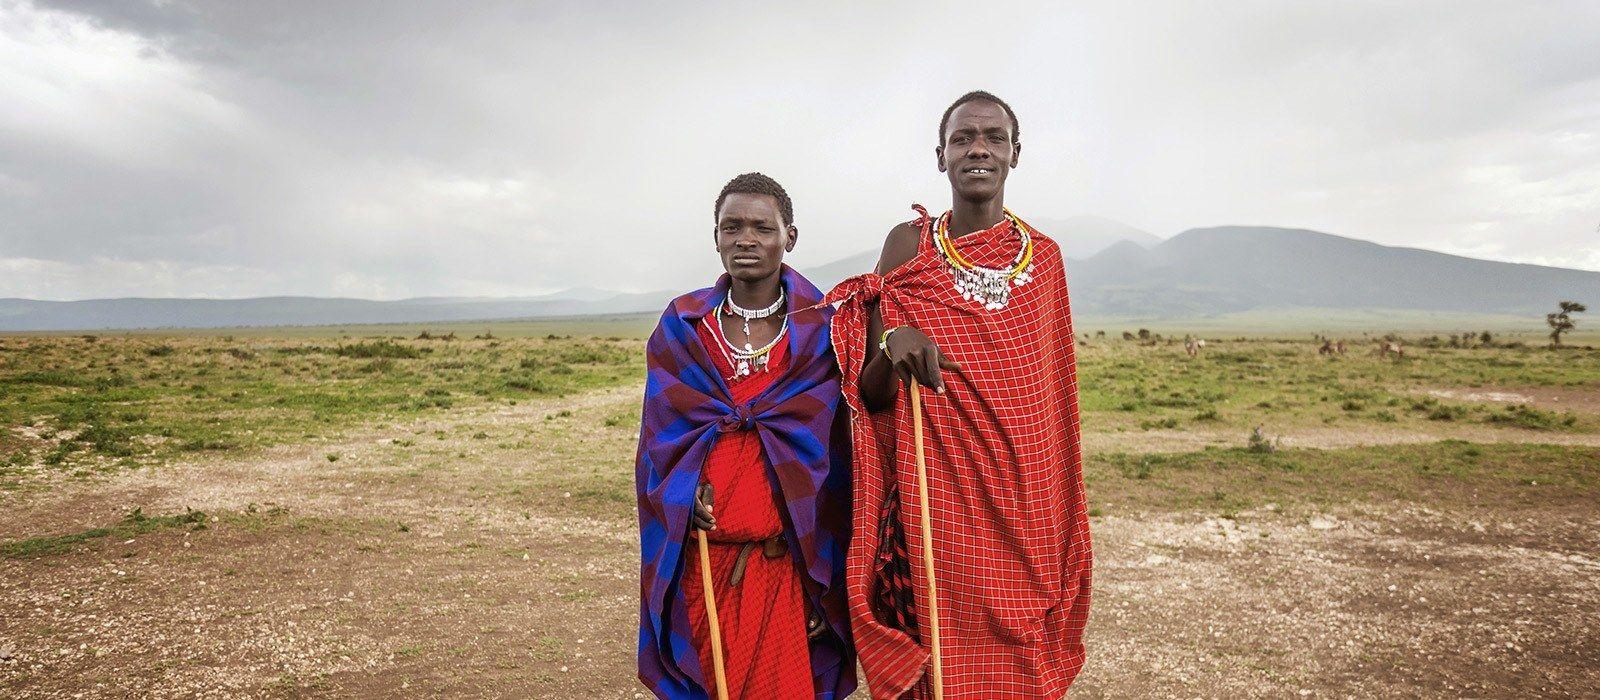 Destination Ngorongoro Crater Tanzania